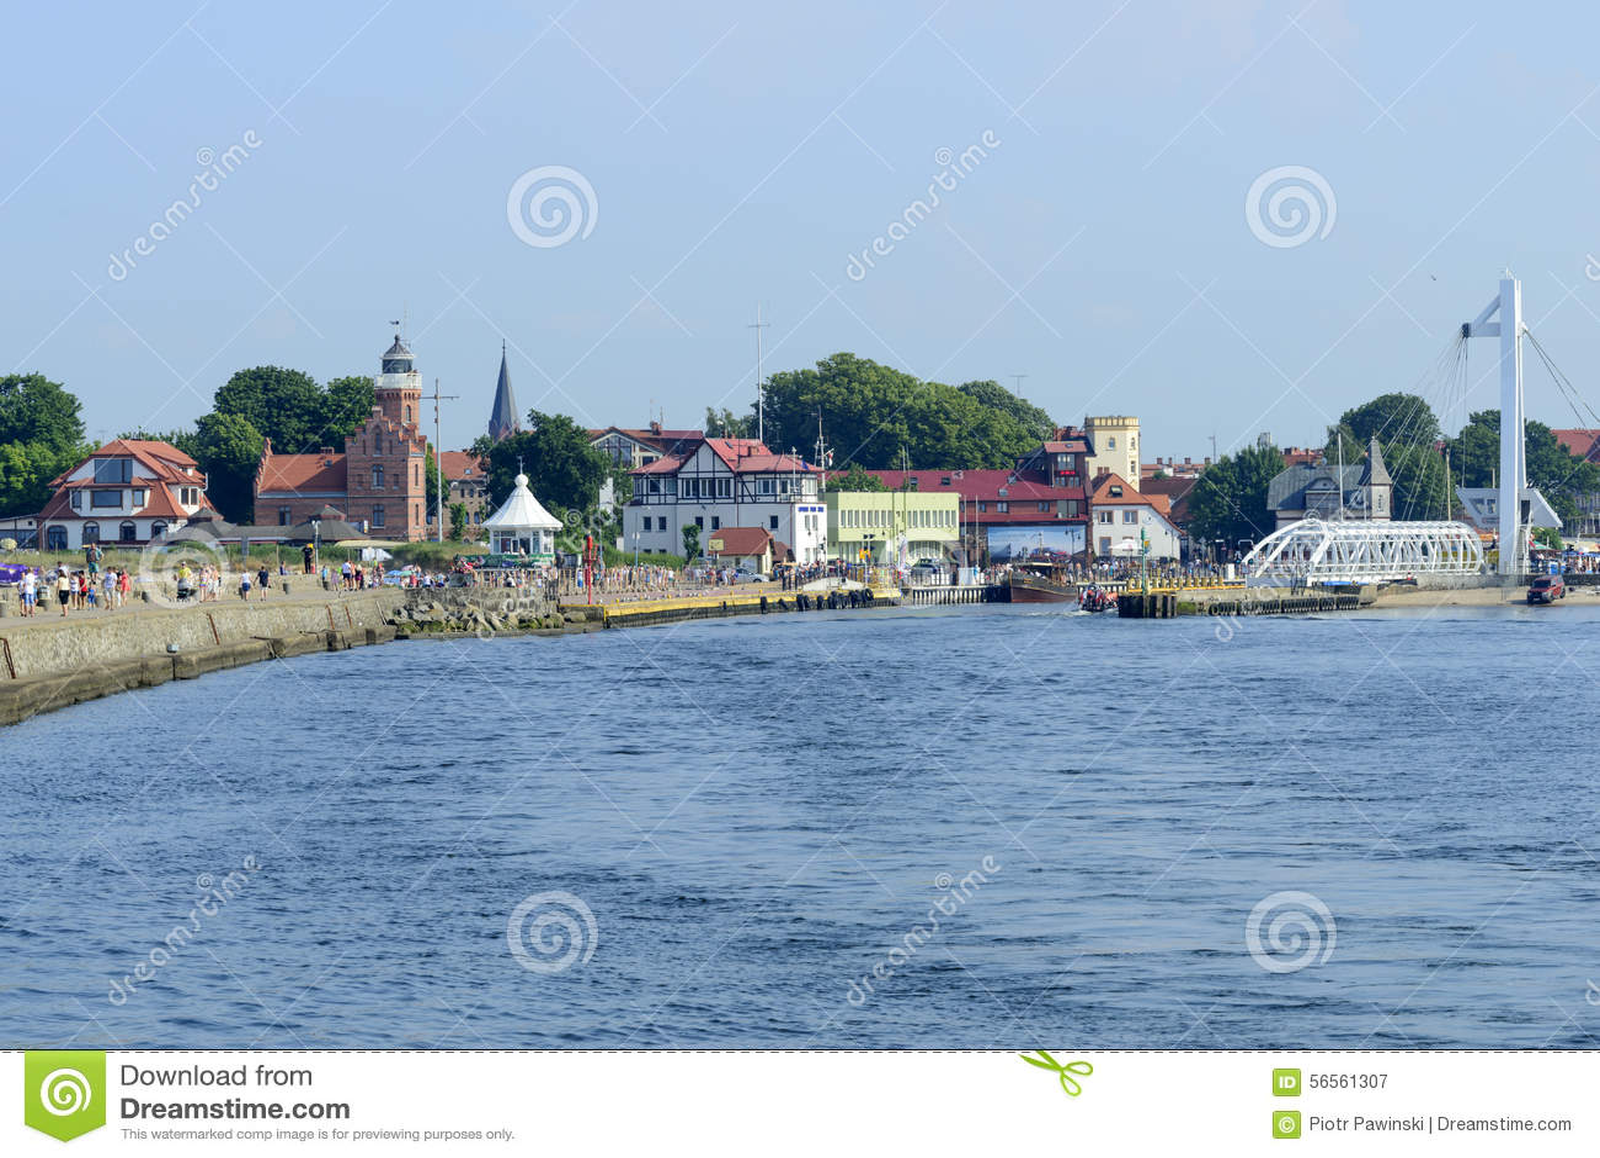 Download Λιμάνι Ustka εκδοτική φωτογραφία. εικόνα από λιμένας - 56561307